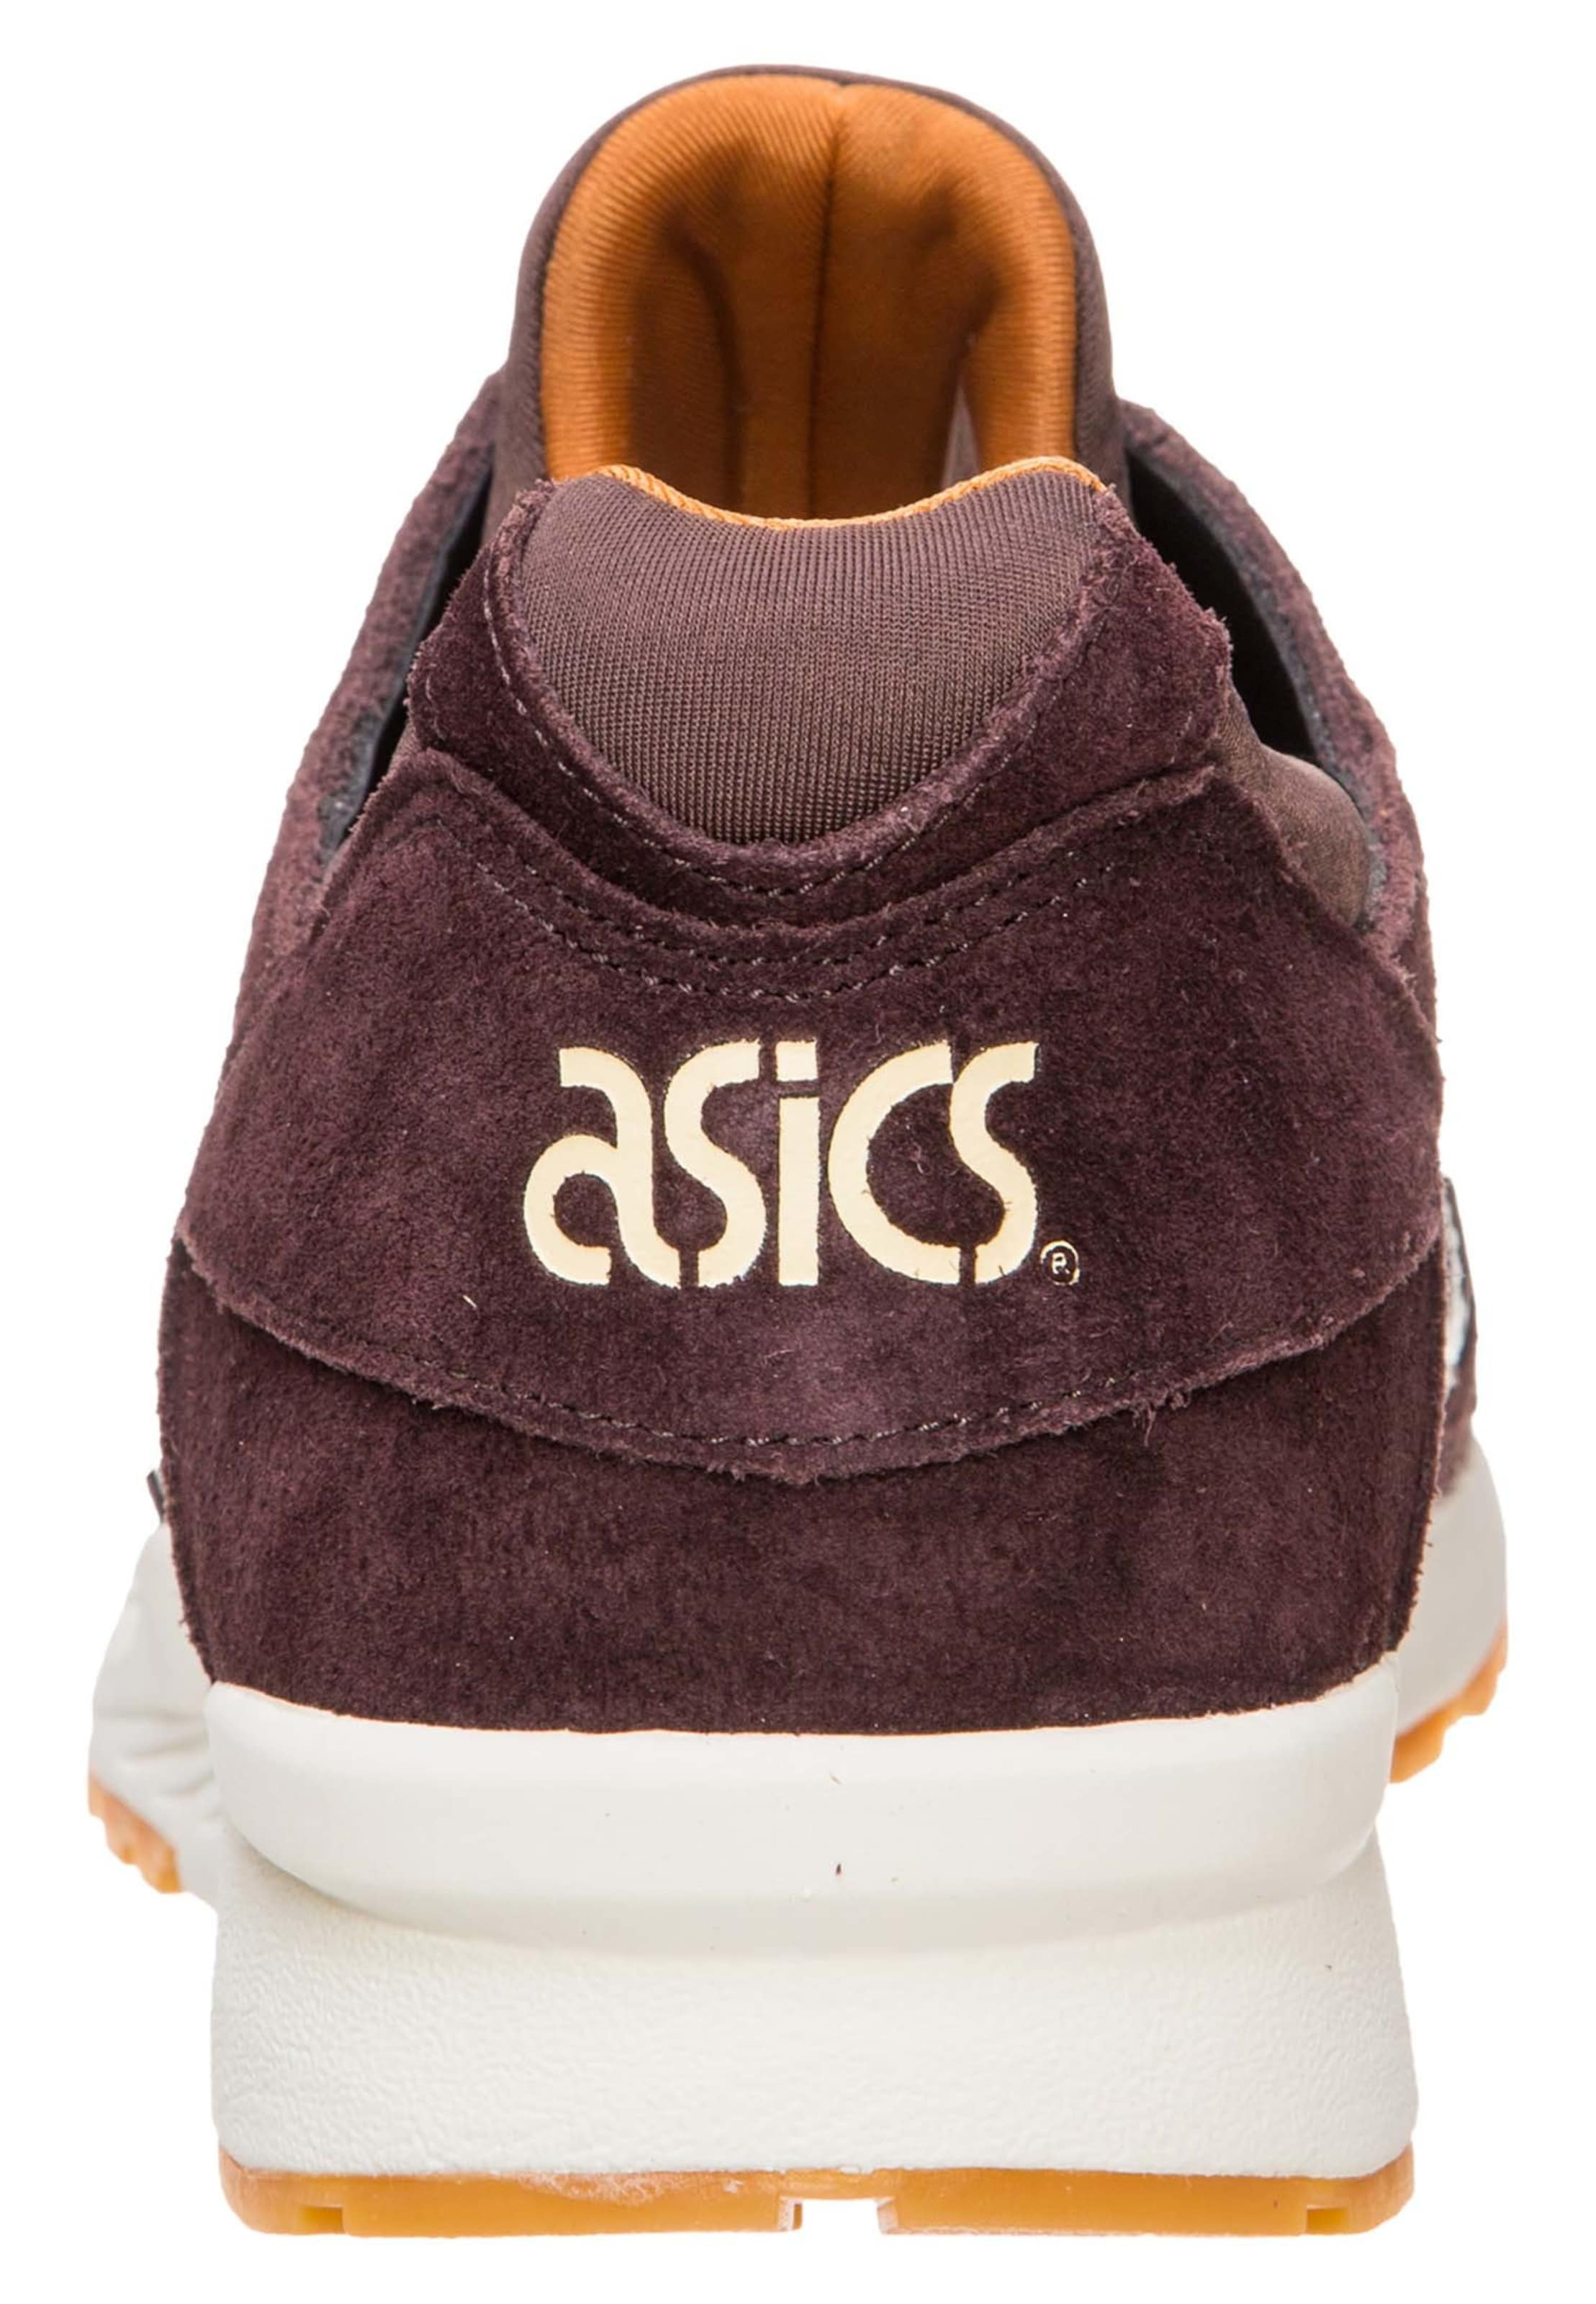 En Aubergine V' lyte Asics Basses Baskets 'gel eEbD2IWH9Y